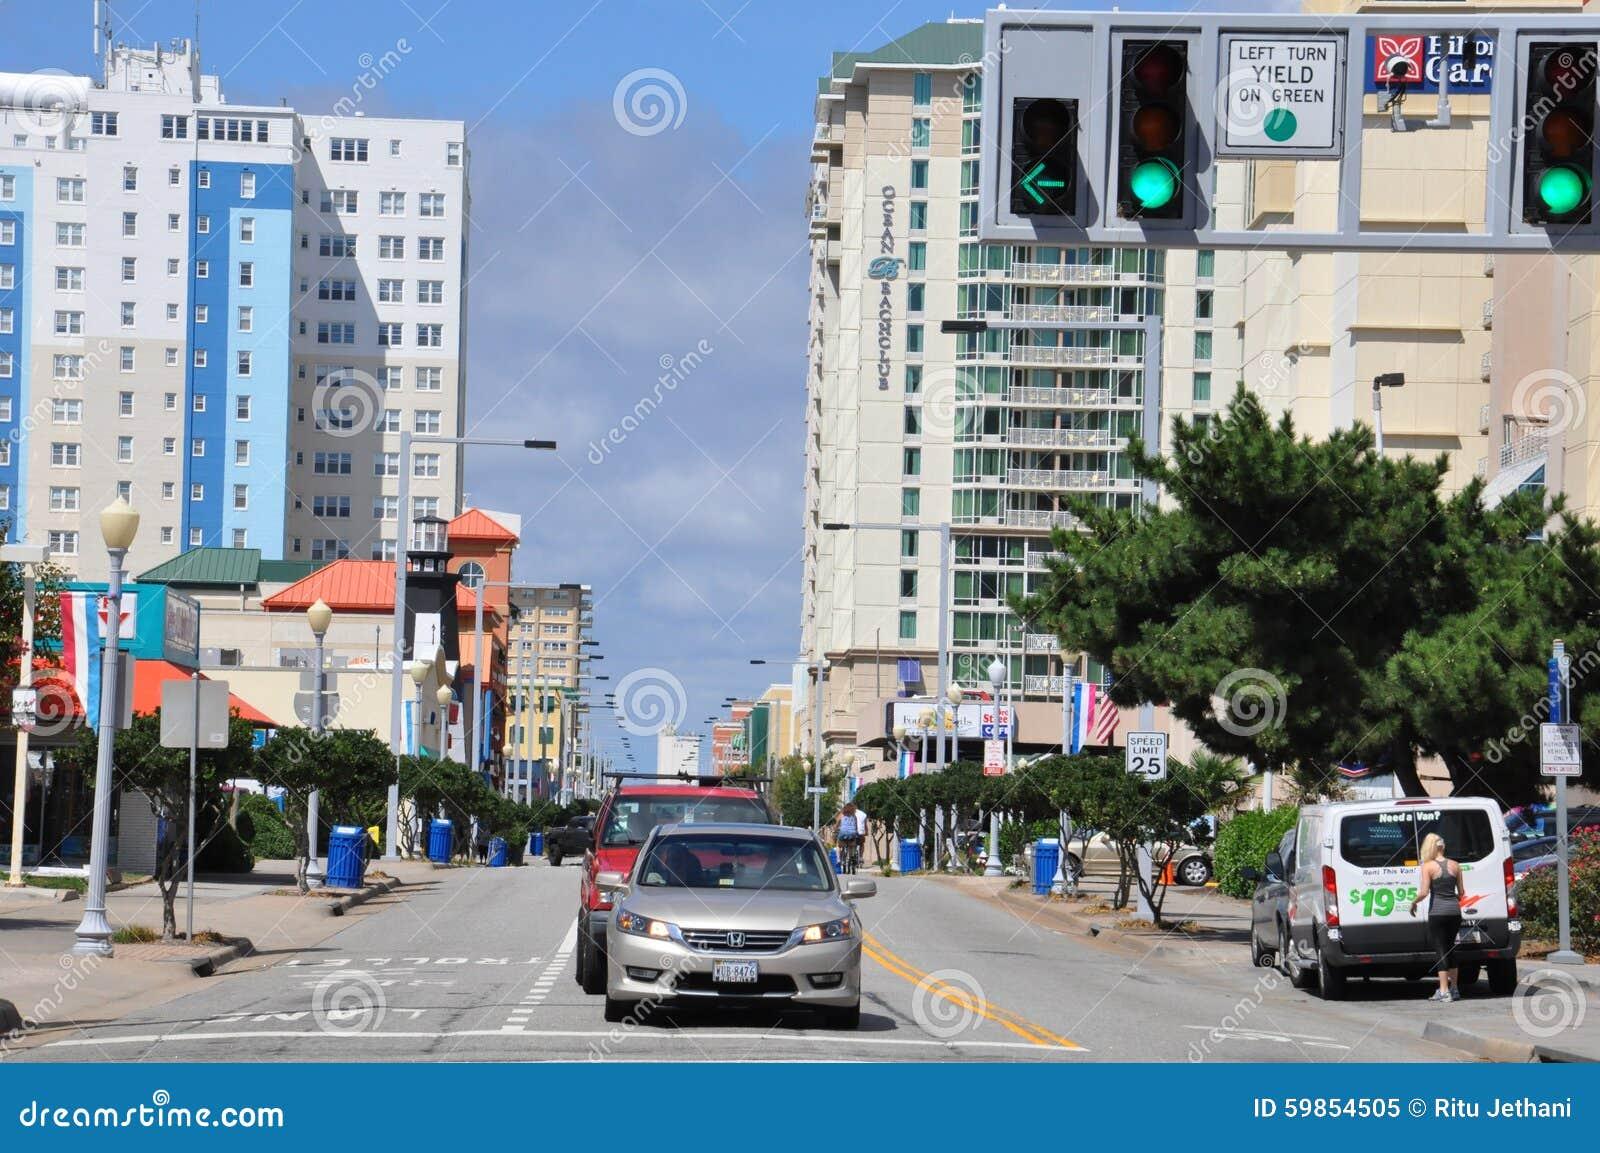 Atlantic avenue in virginia beach editorial image image for 530 terrace ave virginia beach